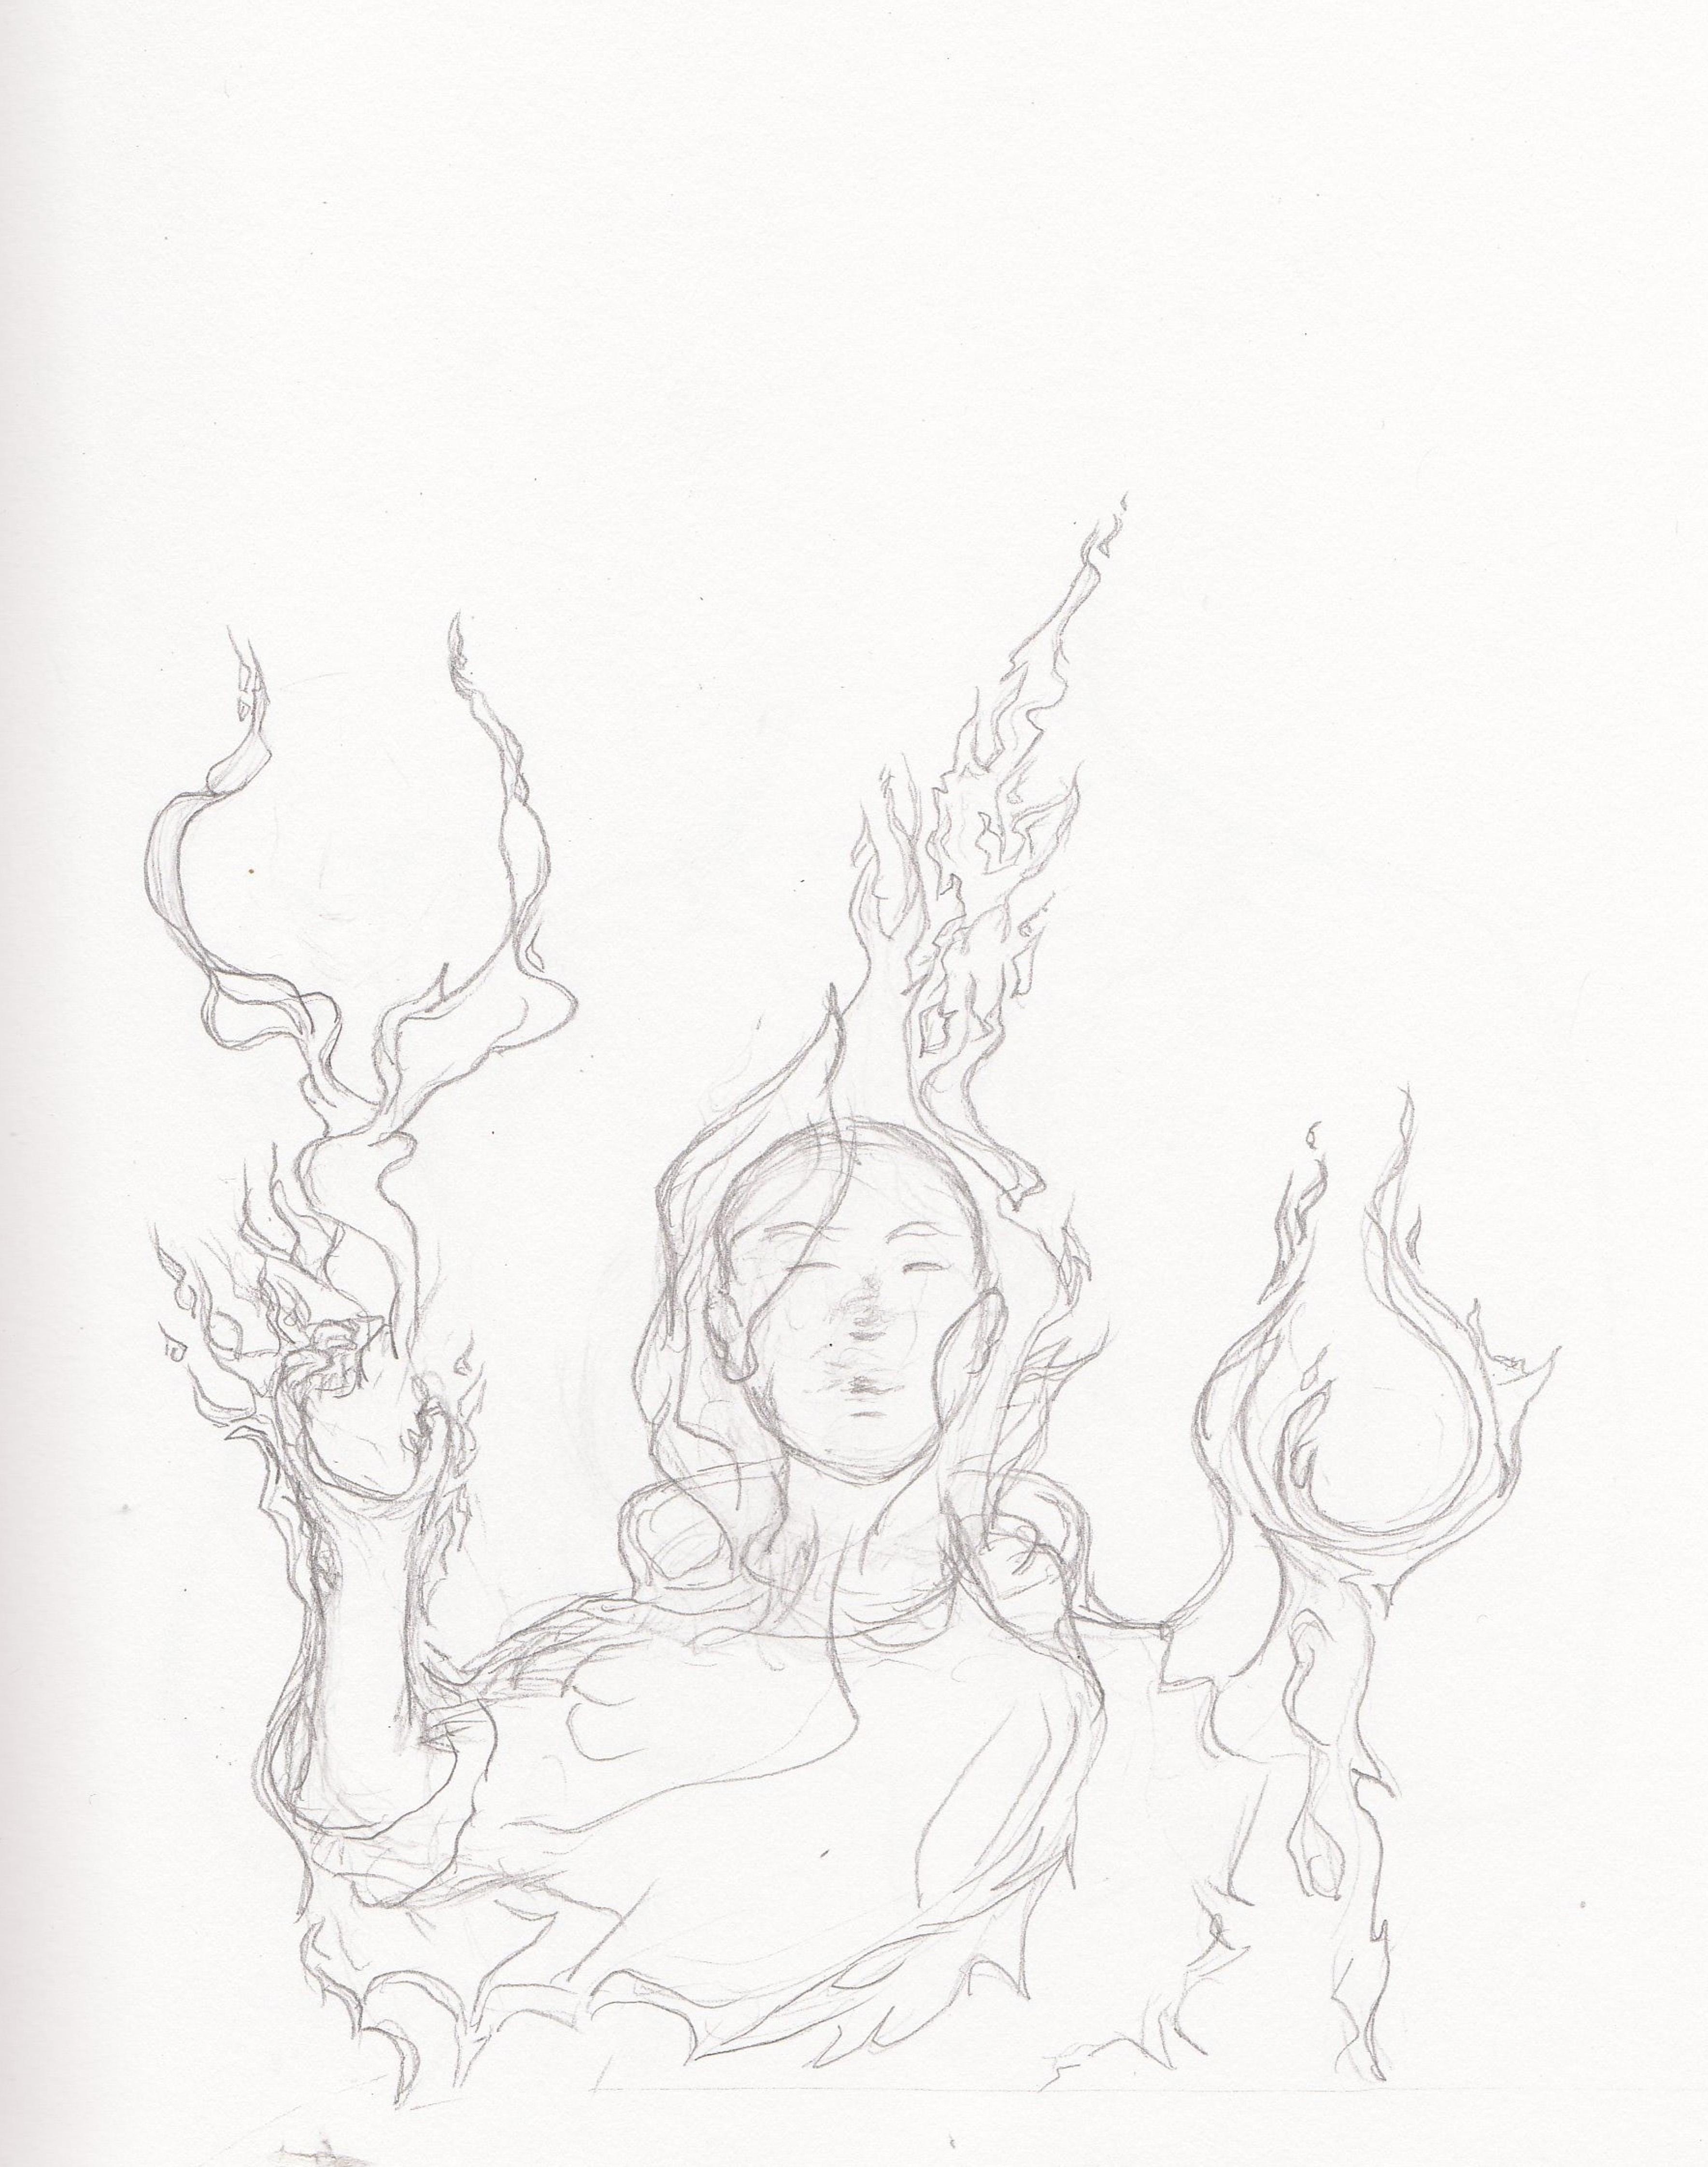 Sktchbk II 2 Holy Fire by TreesAwake